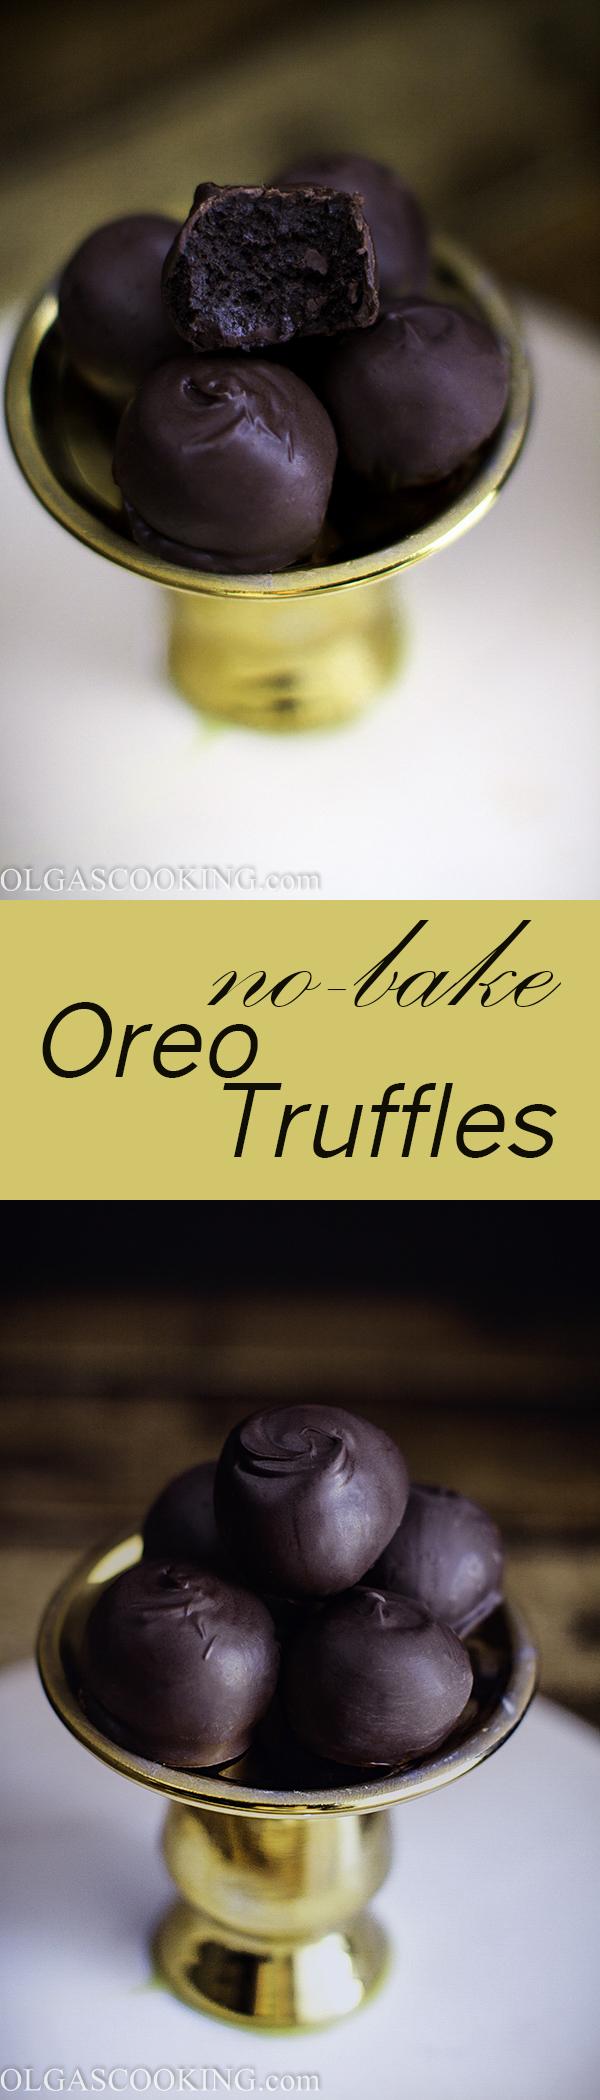 No-bake Oreo Truffles. Simple chocolate goodness!